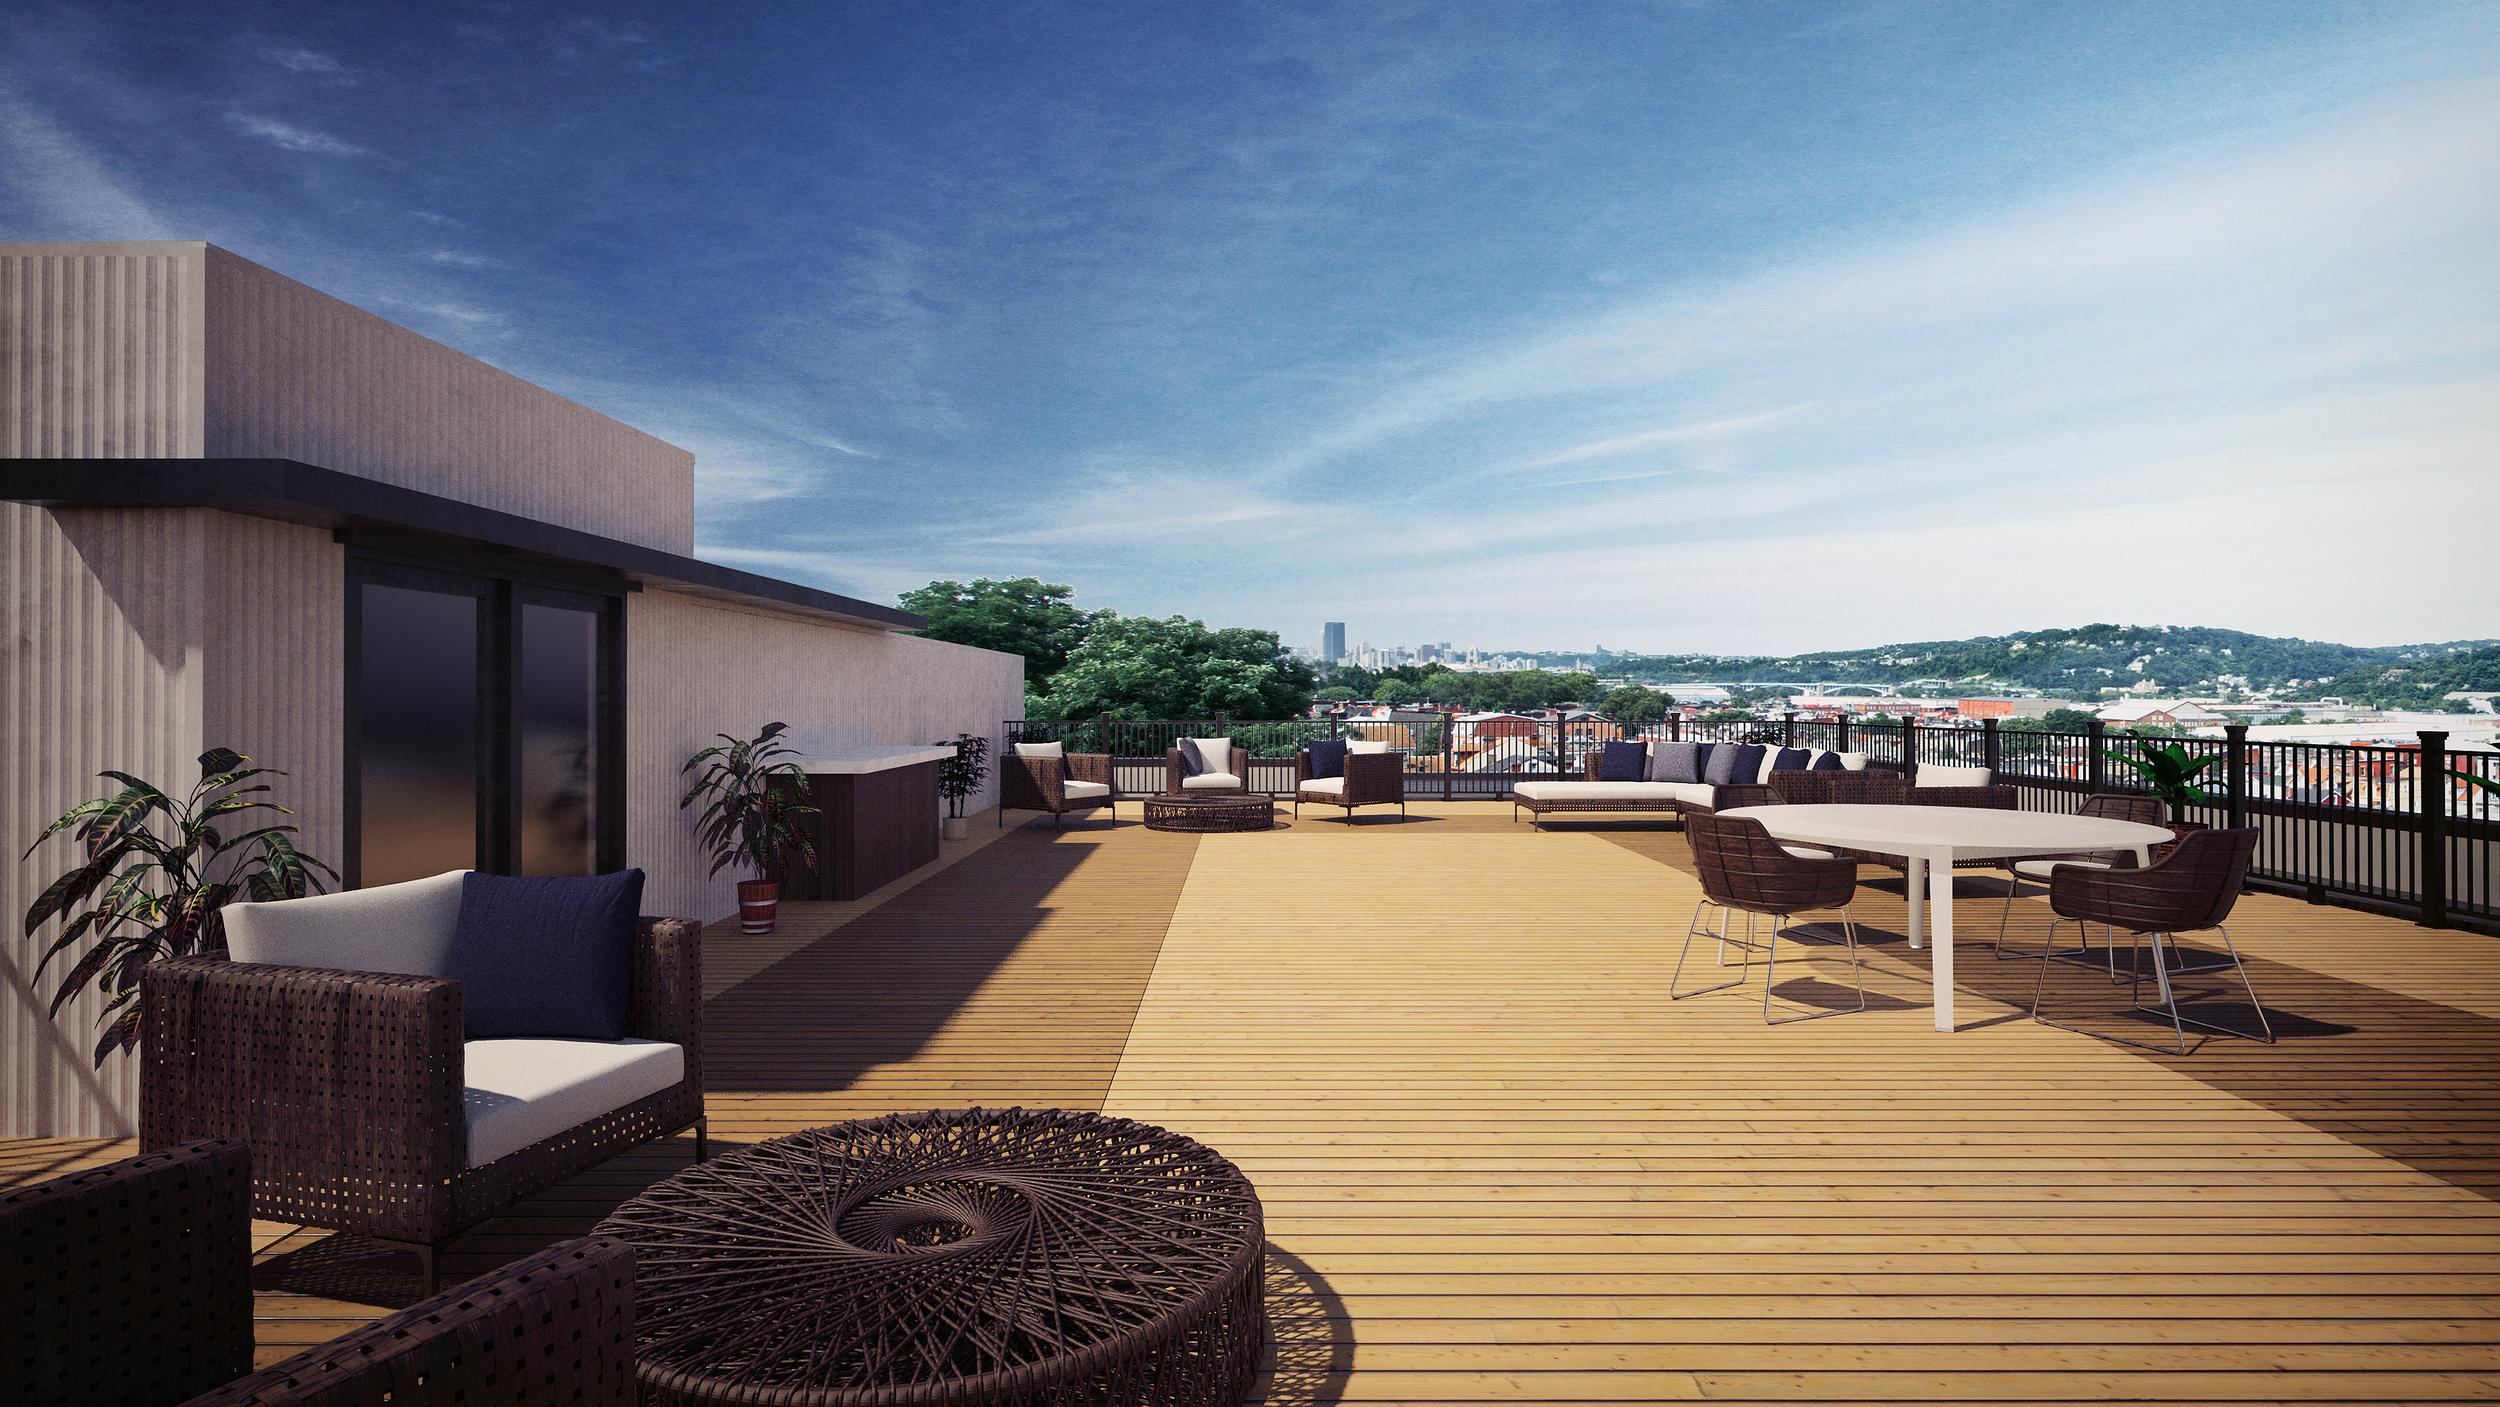 Roof_02.jpg